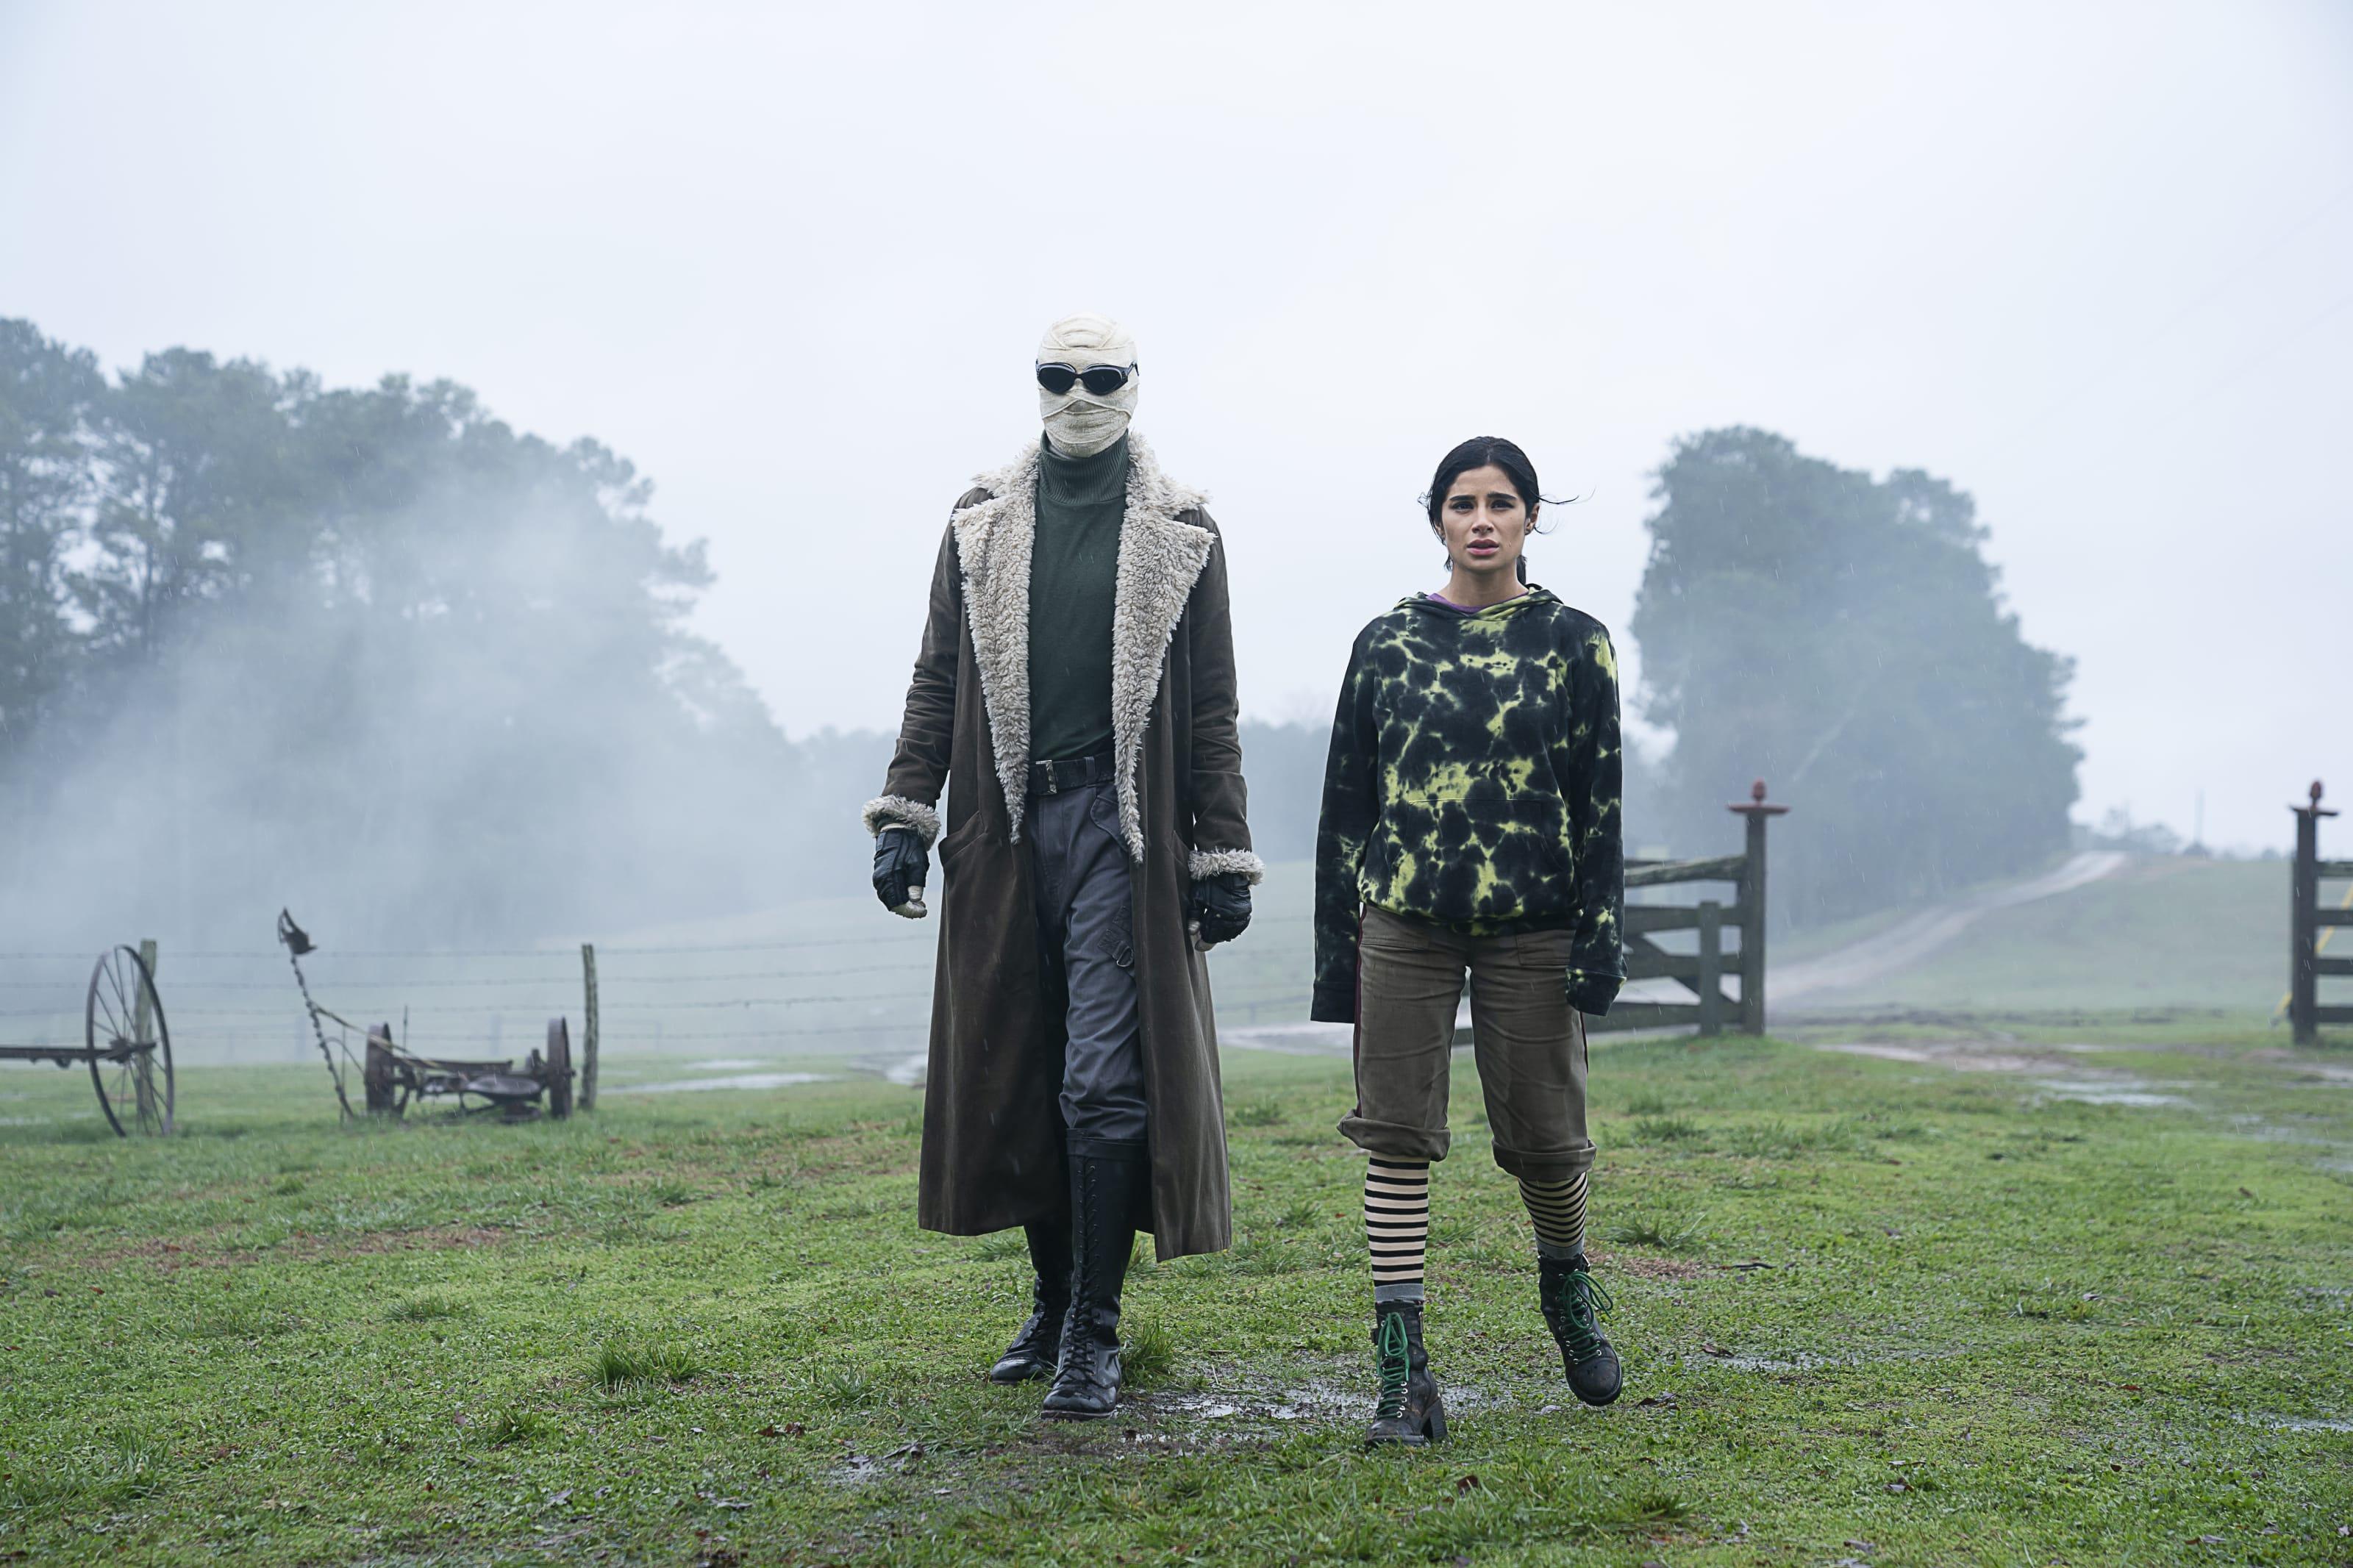 Larry Trainor and Jane in Doom Patrol Season 2, Episode 8.